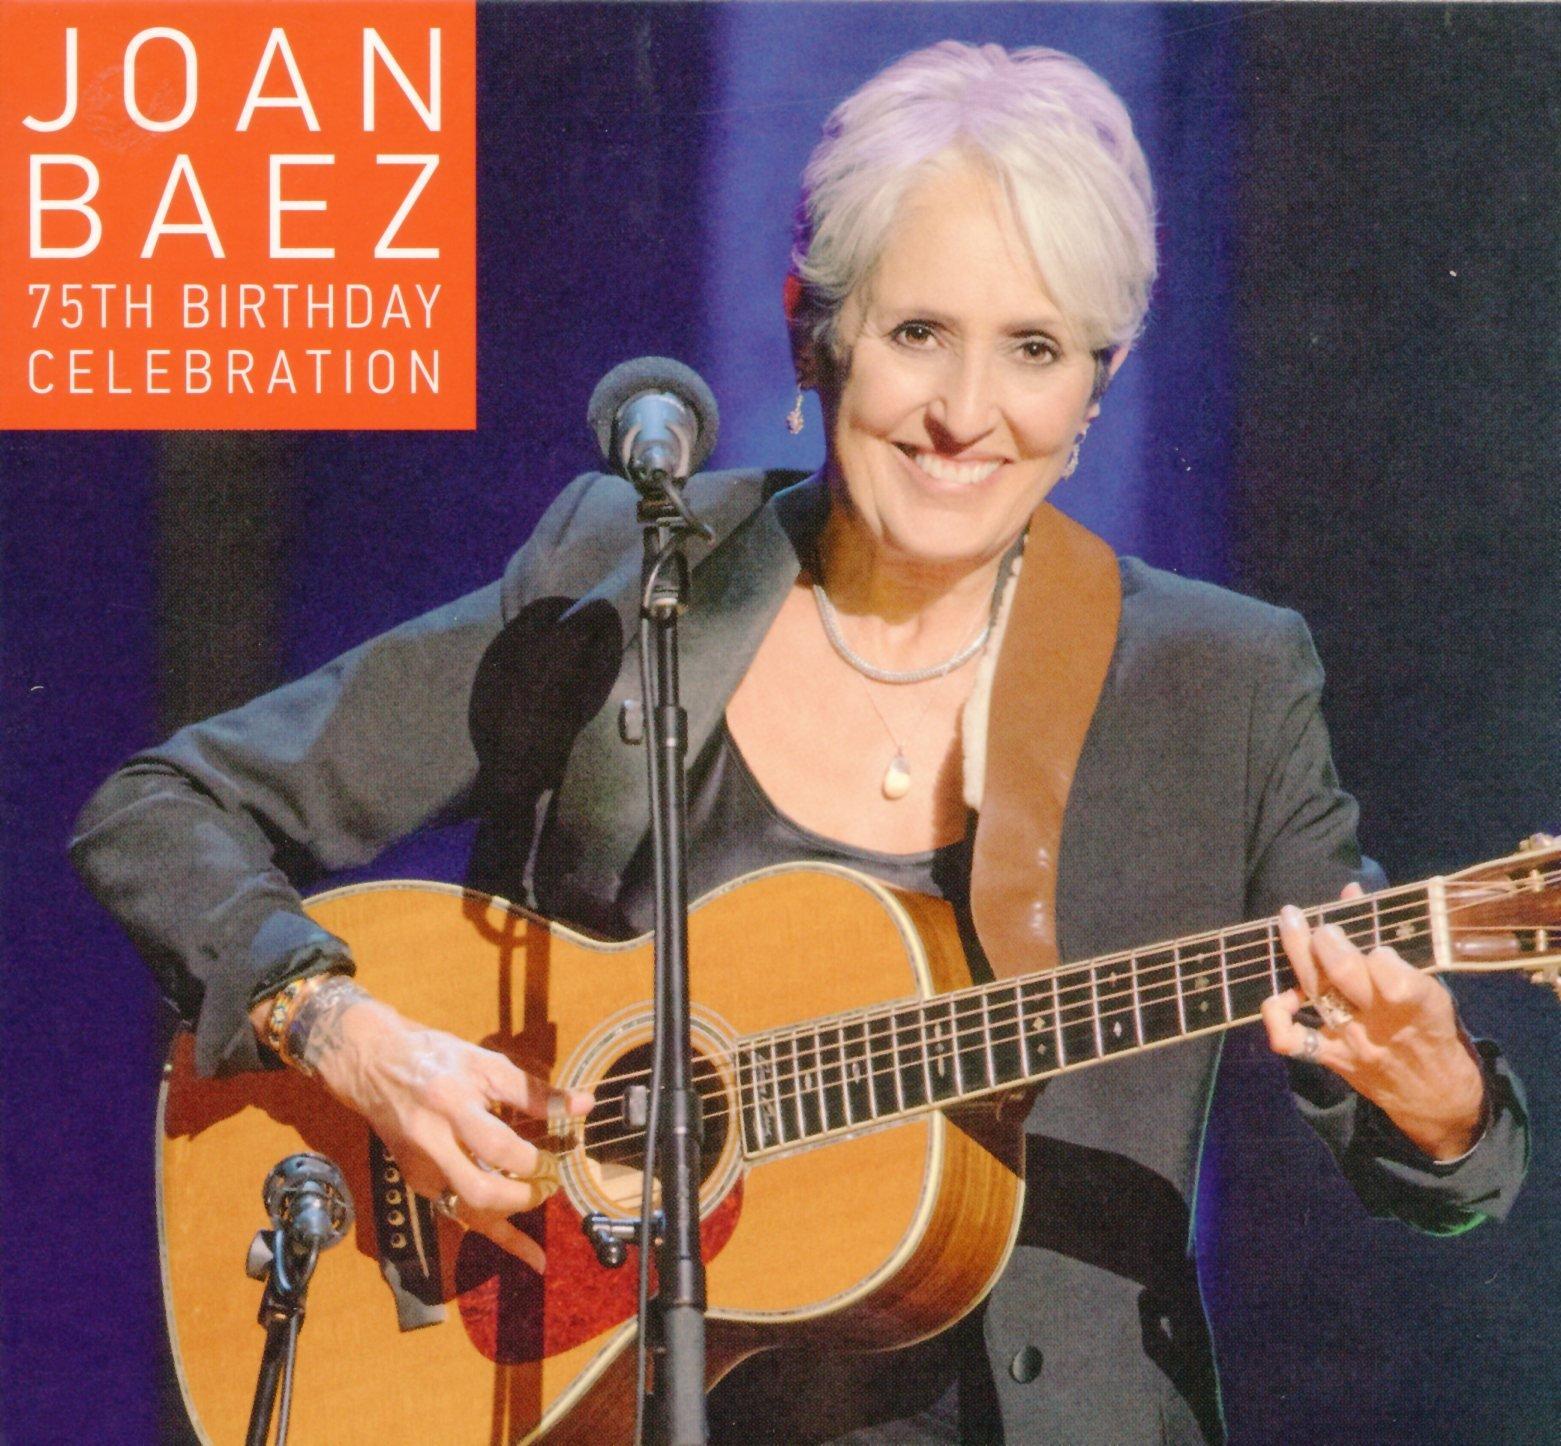 Joan Baez 75th Birthday Celebration